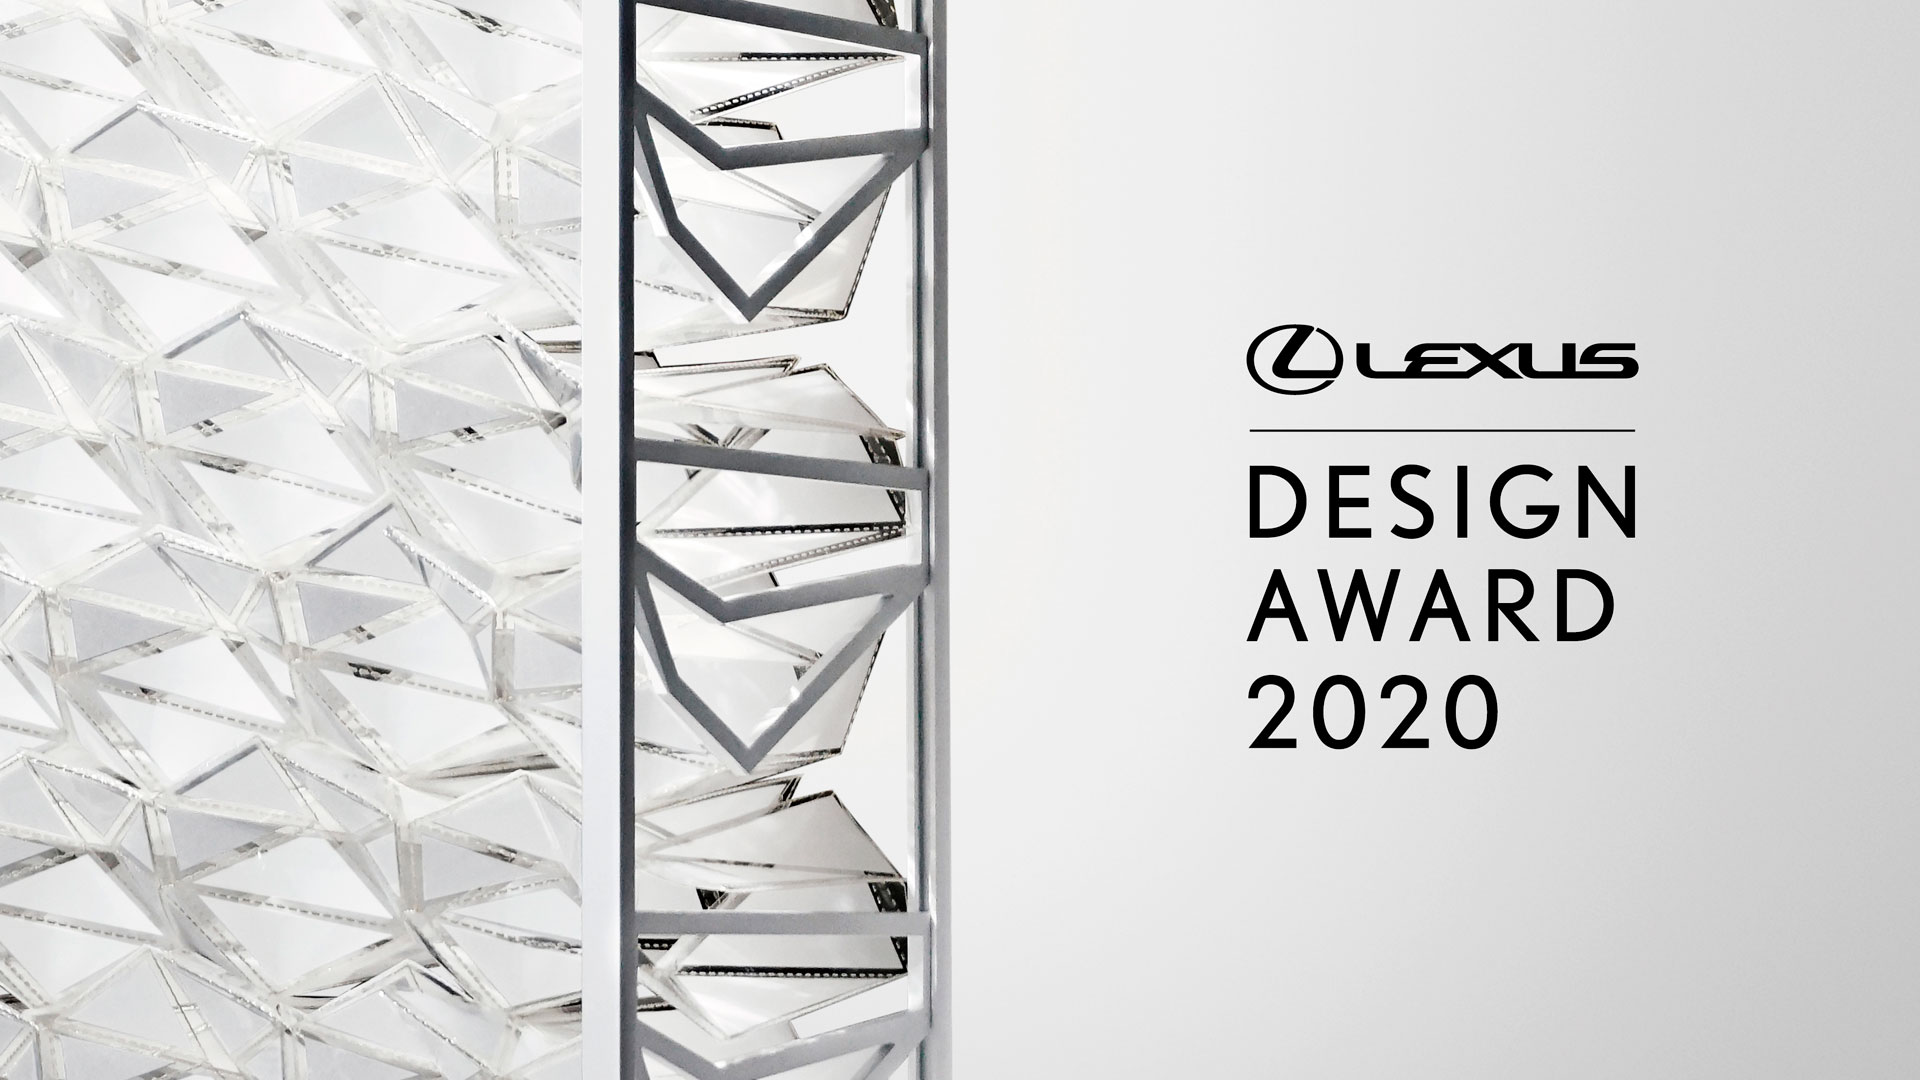 Lexus Design Award 2020 hero asset